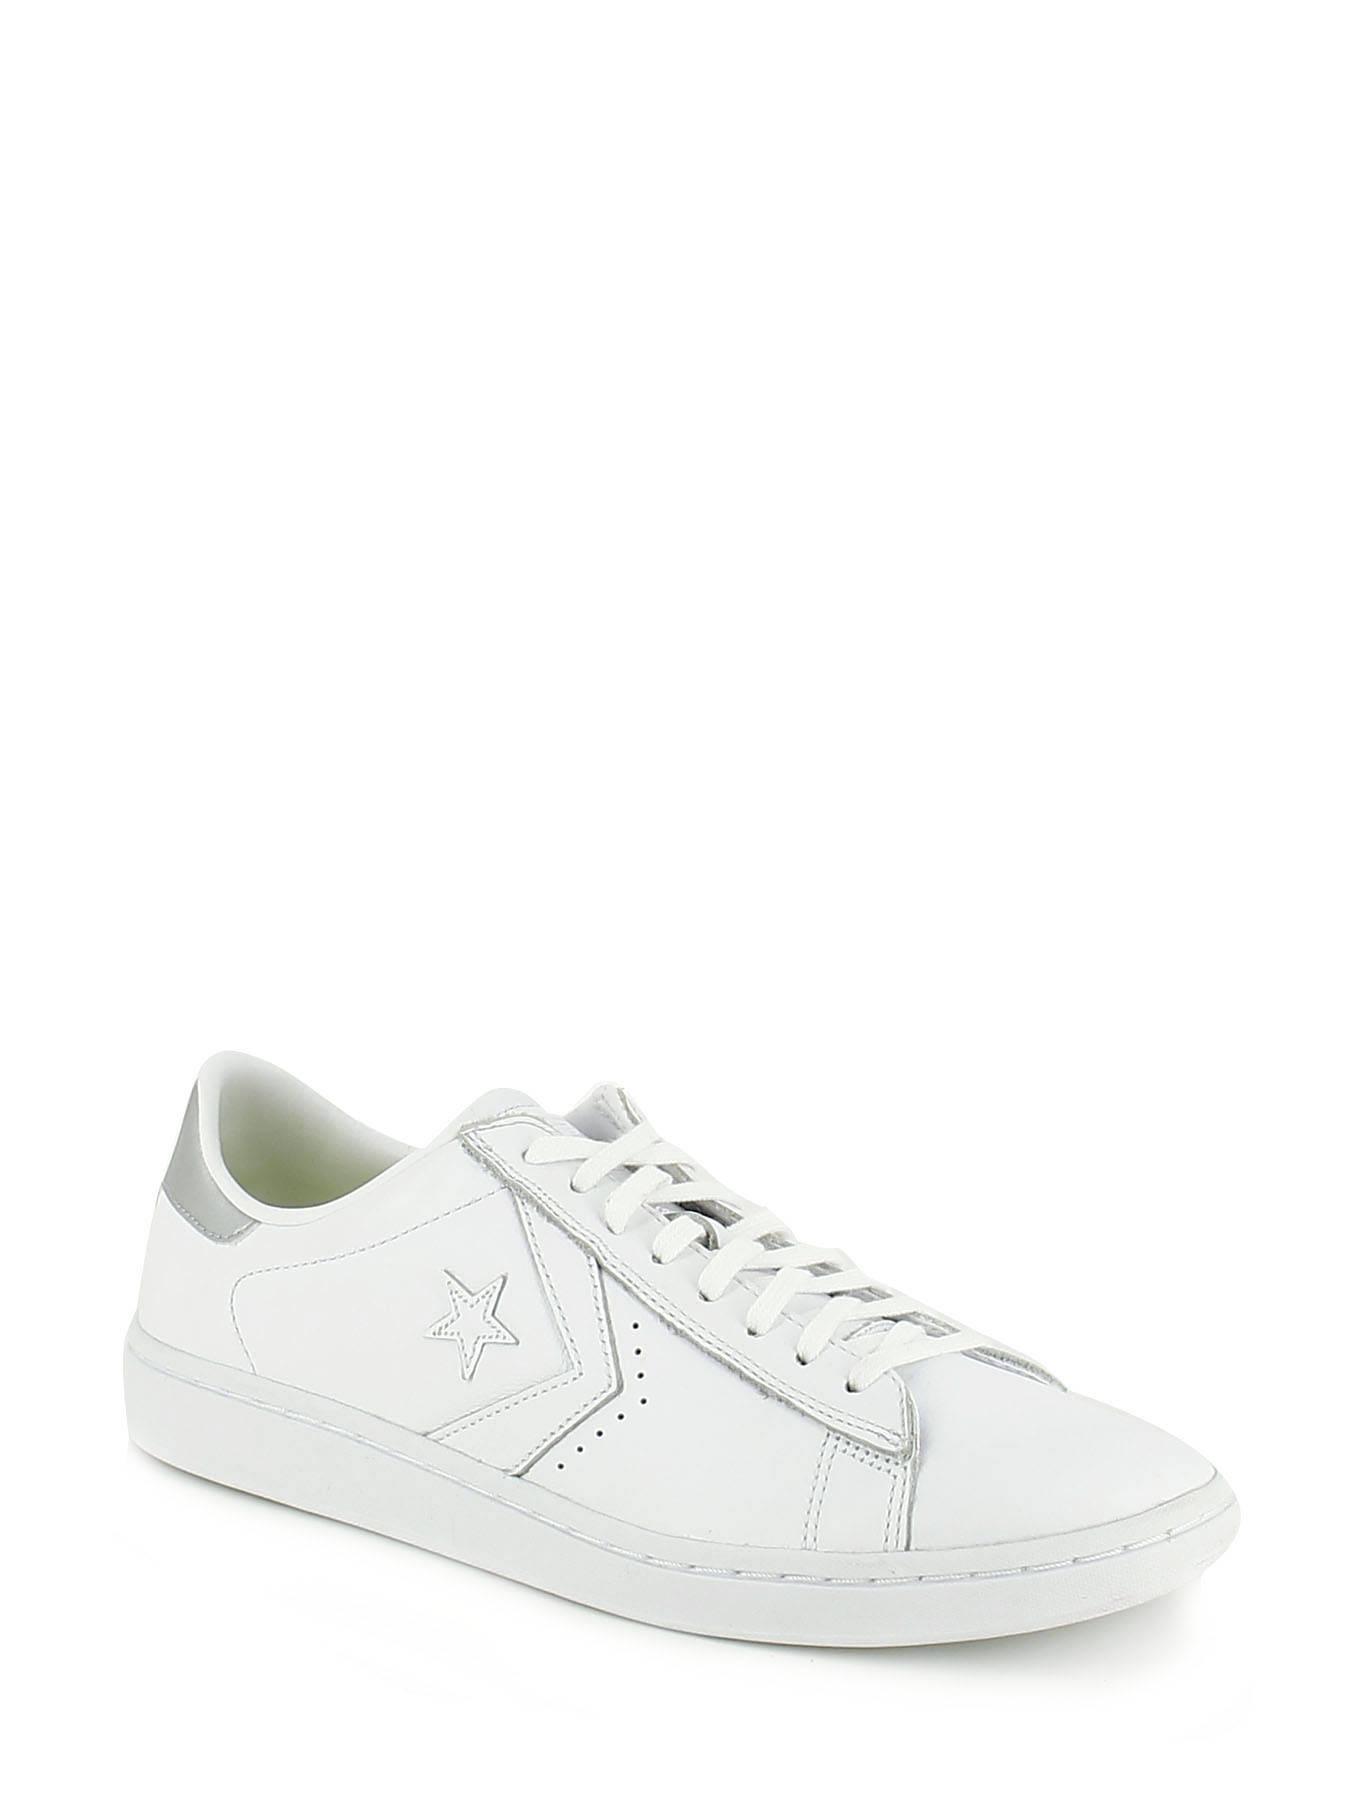 a36eade90a3 Sneakers Converse Baskets mode PL LP OX WH/SIL te koop aan de beste ...